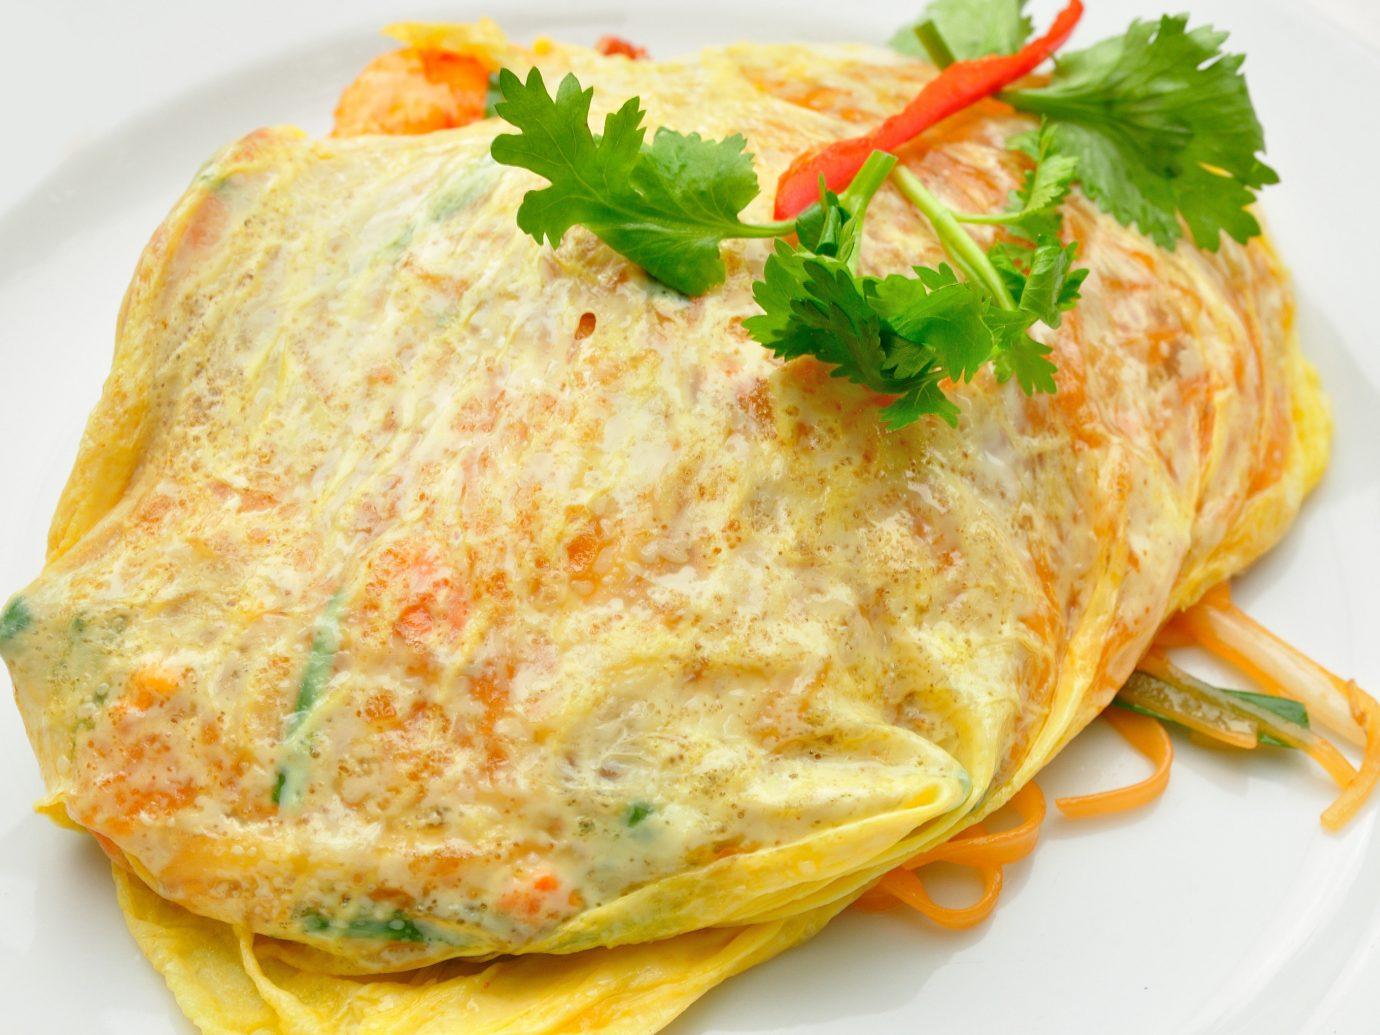 Jetsetter Guides food plate dish omelette meal breakfast cuisine omurice white fish produce tortilla de patatas frittata vegetable sauce omelet meat